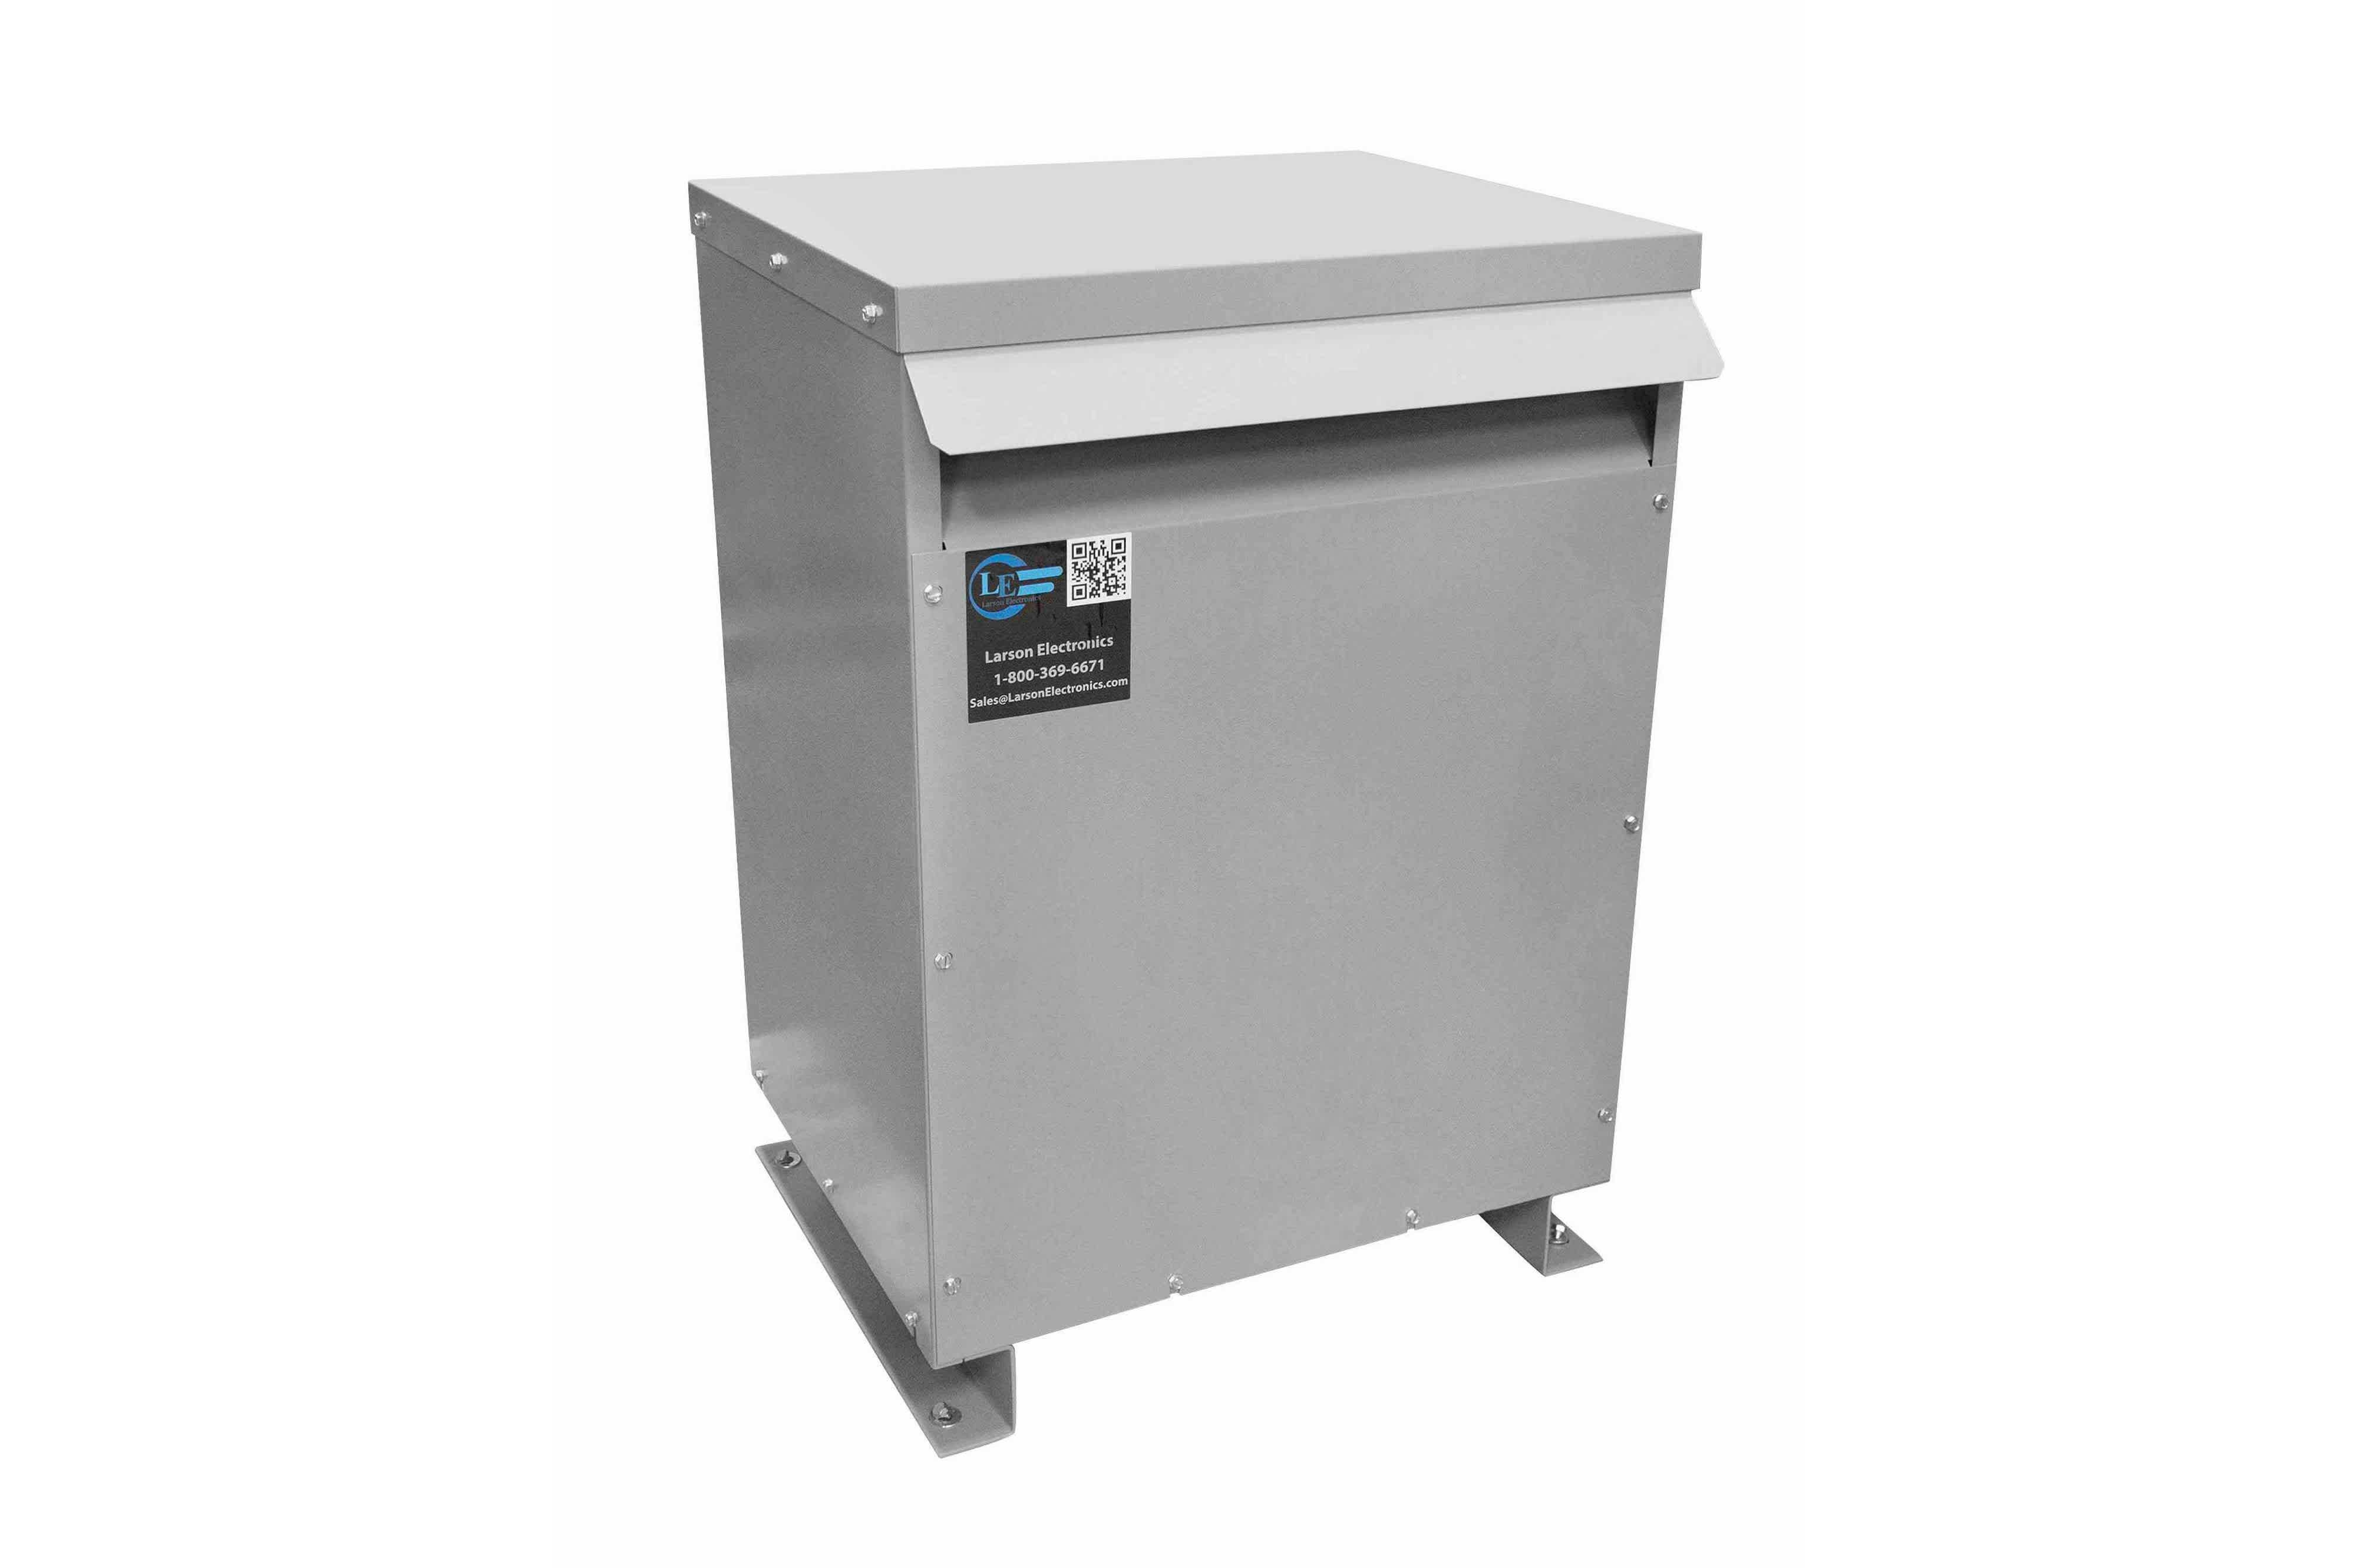 1000 kVA 3PH DOE Transformer, 600V Delta Primary, 380Y/220 Wye-N Secondary, N3R, Ventilated, 60 Hz